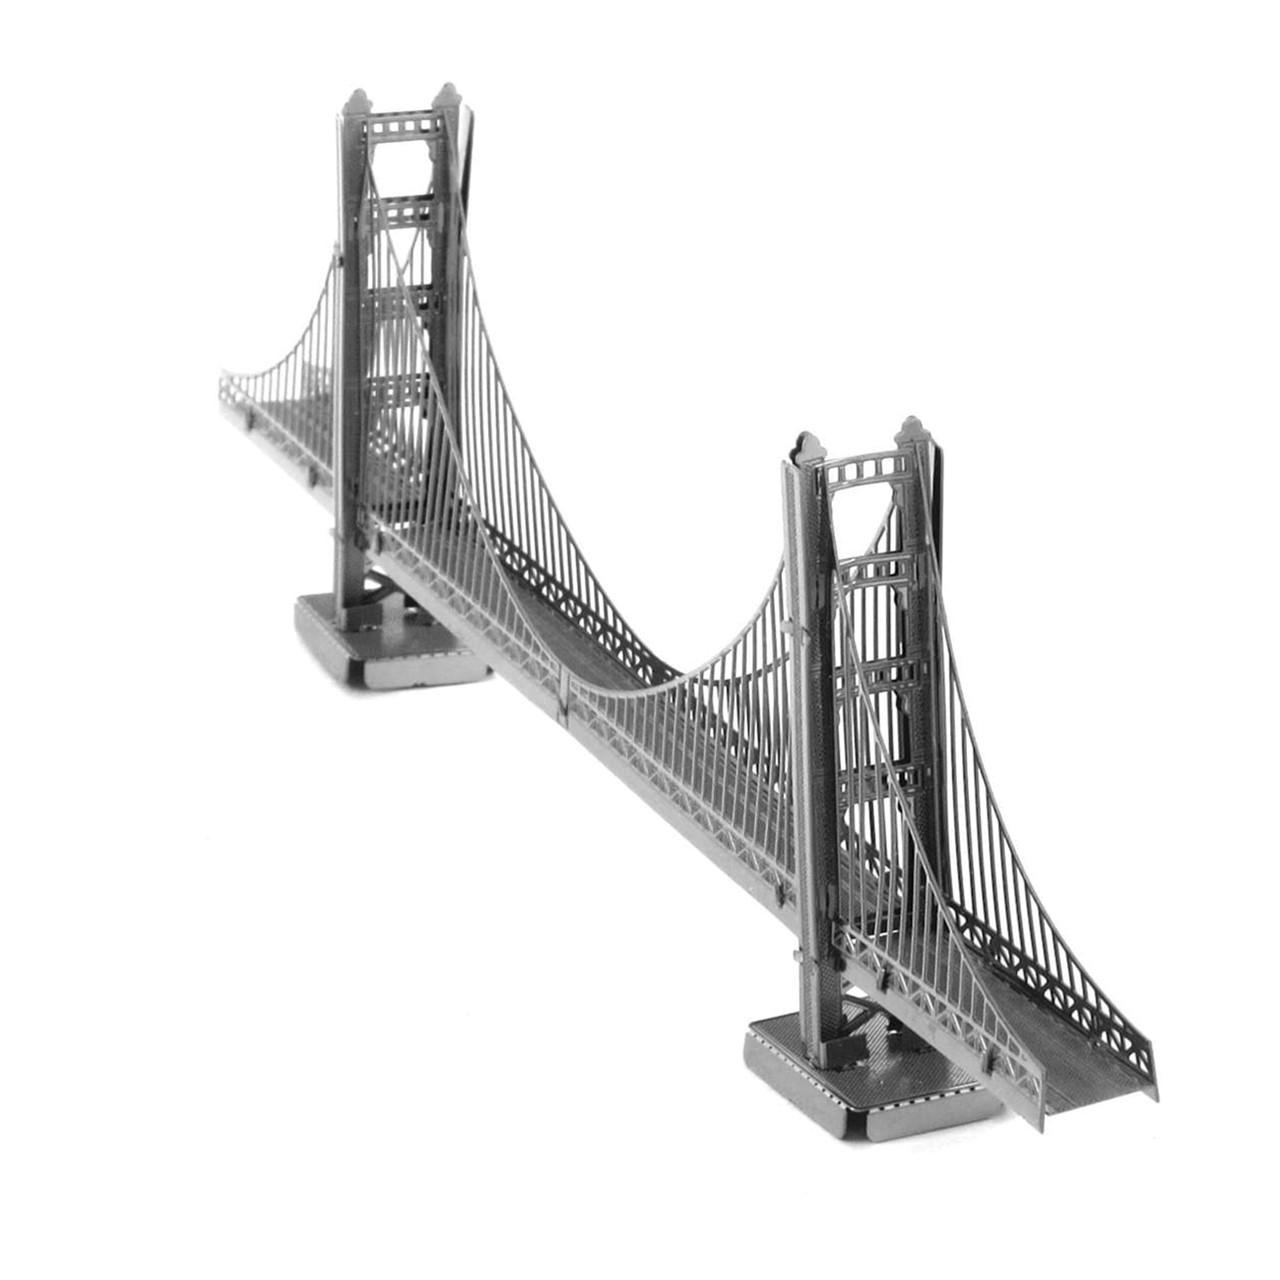 Metal Earth SAN FRANCISCO GOLDEN GATE BRIDGE in GOLD 3D Puzzle Micro Model